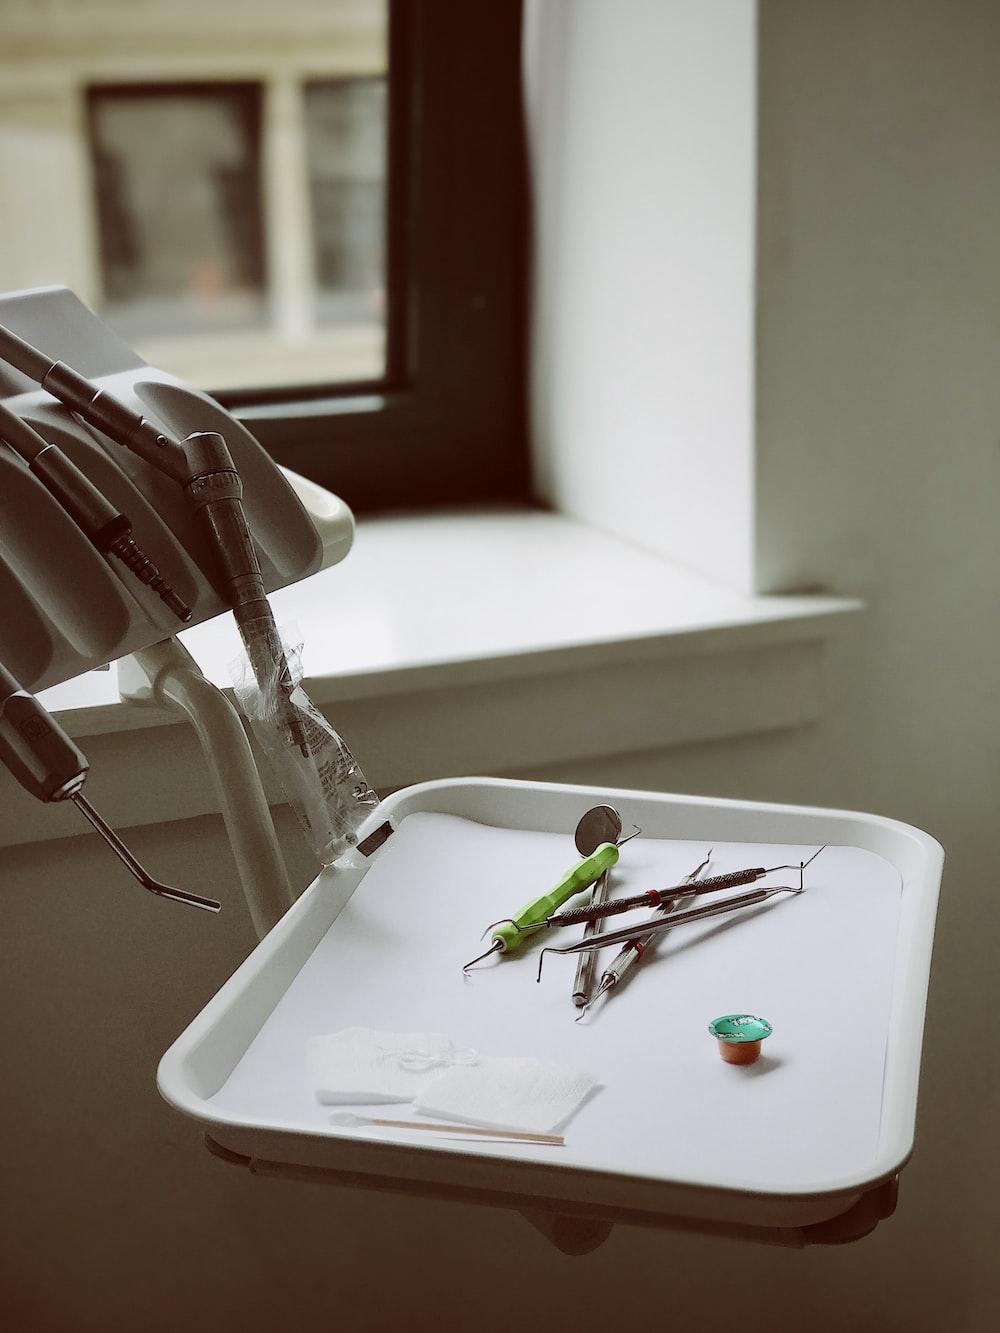 white plastic tray